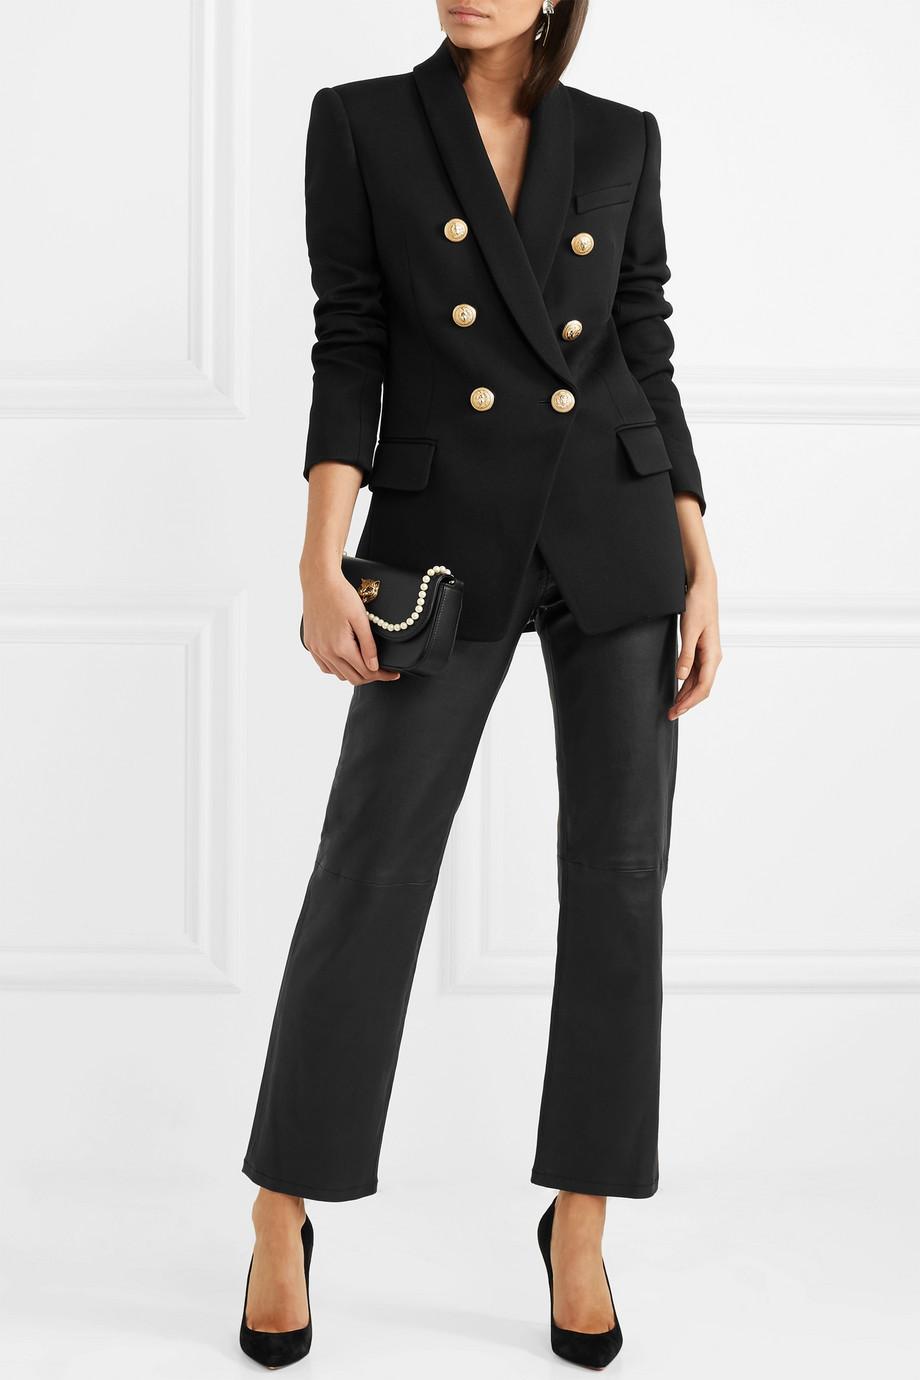 Balmain Double-breasted wool-twill blazer $2,090